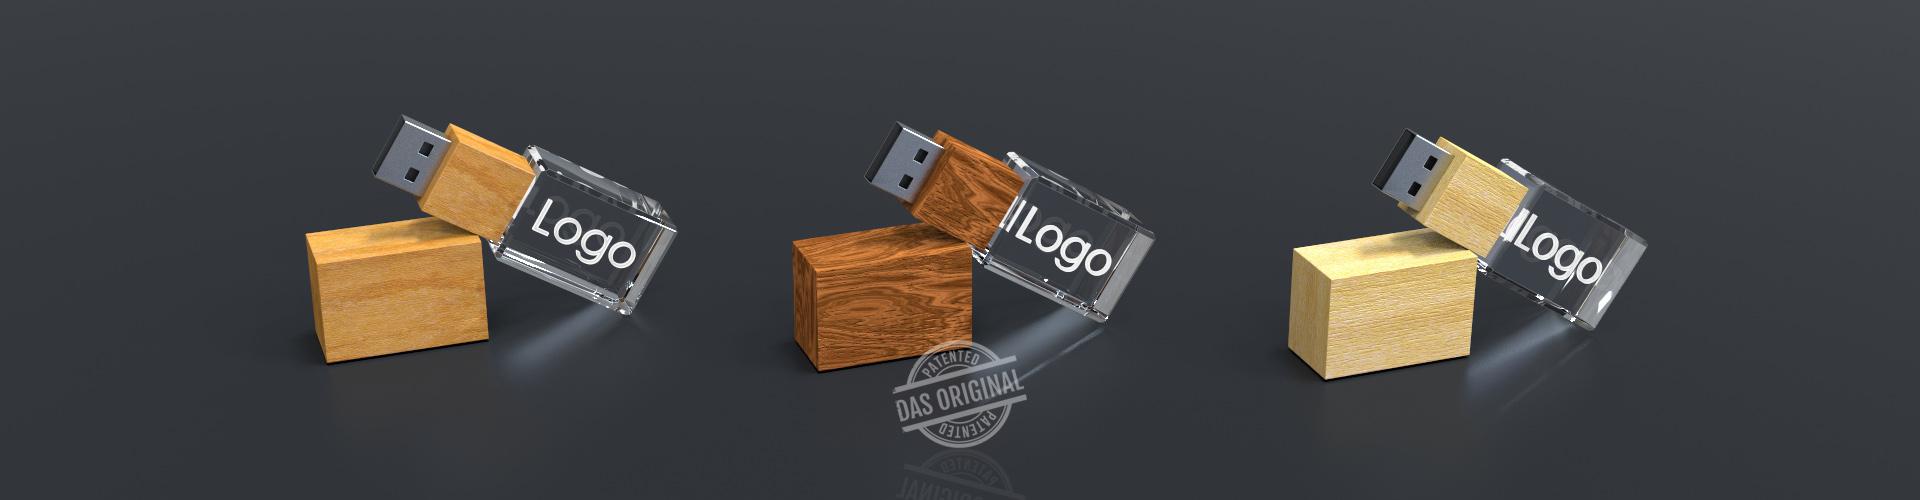 USB Crystal Wodd Erstes Bild 2 - USB CRYSTAL WOOD